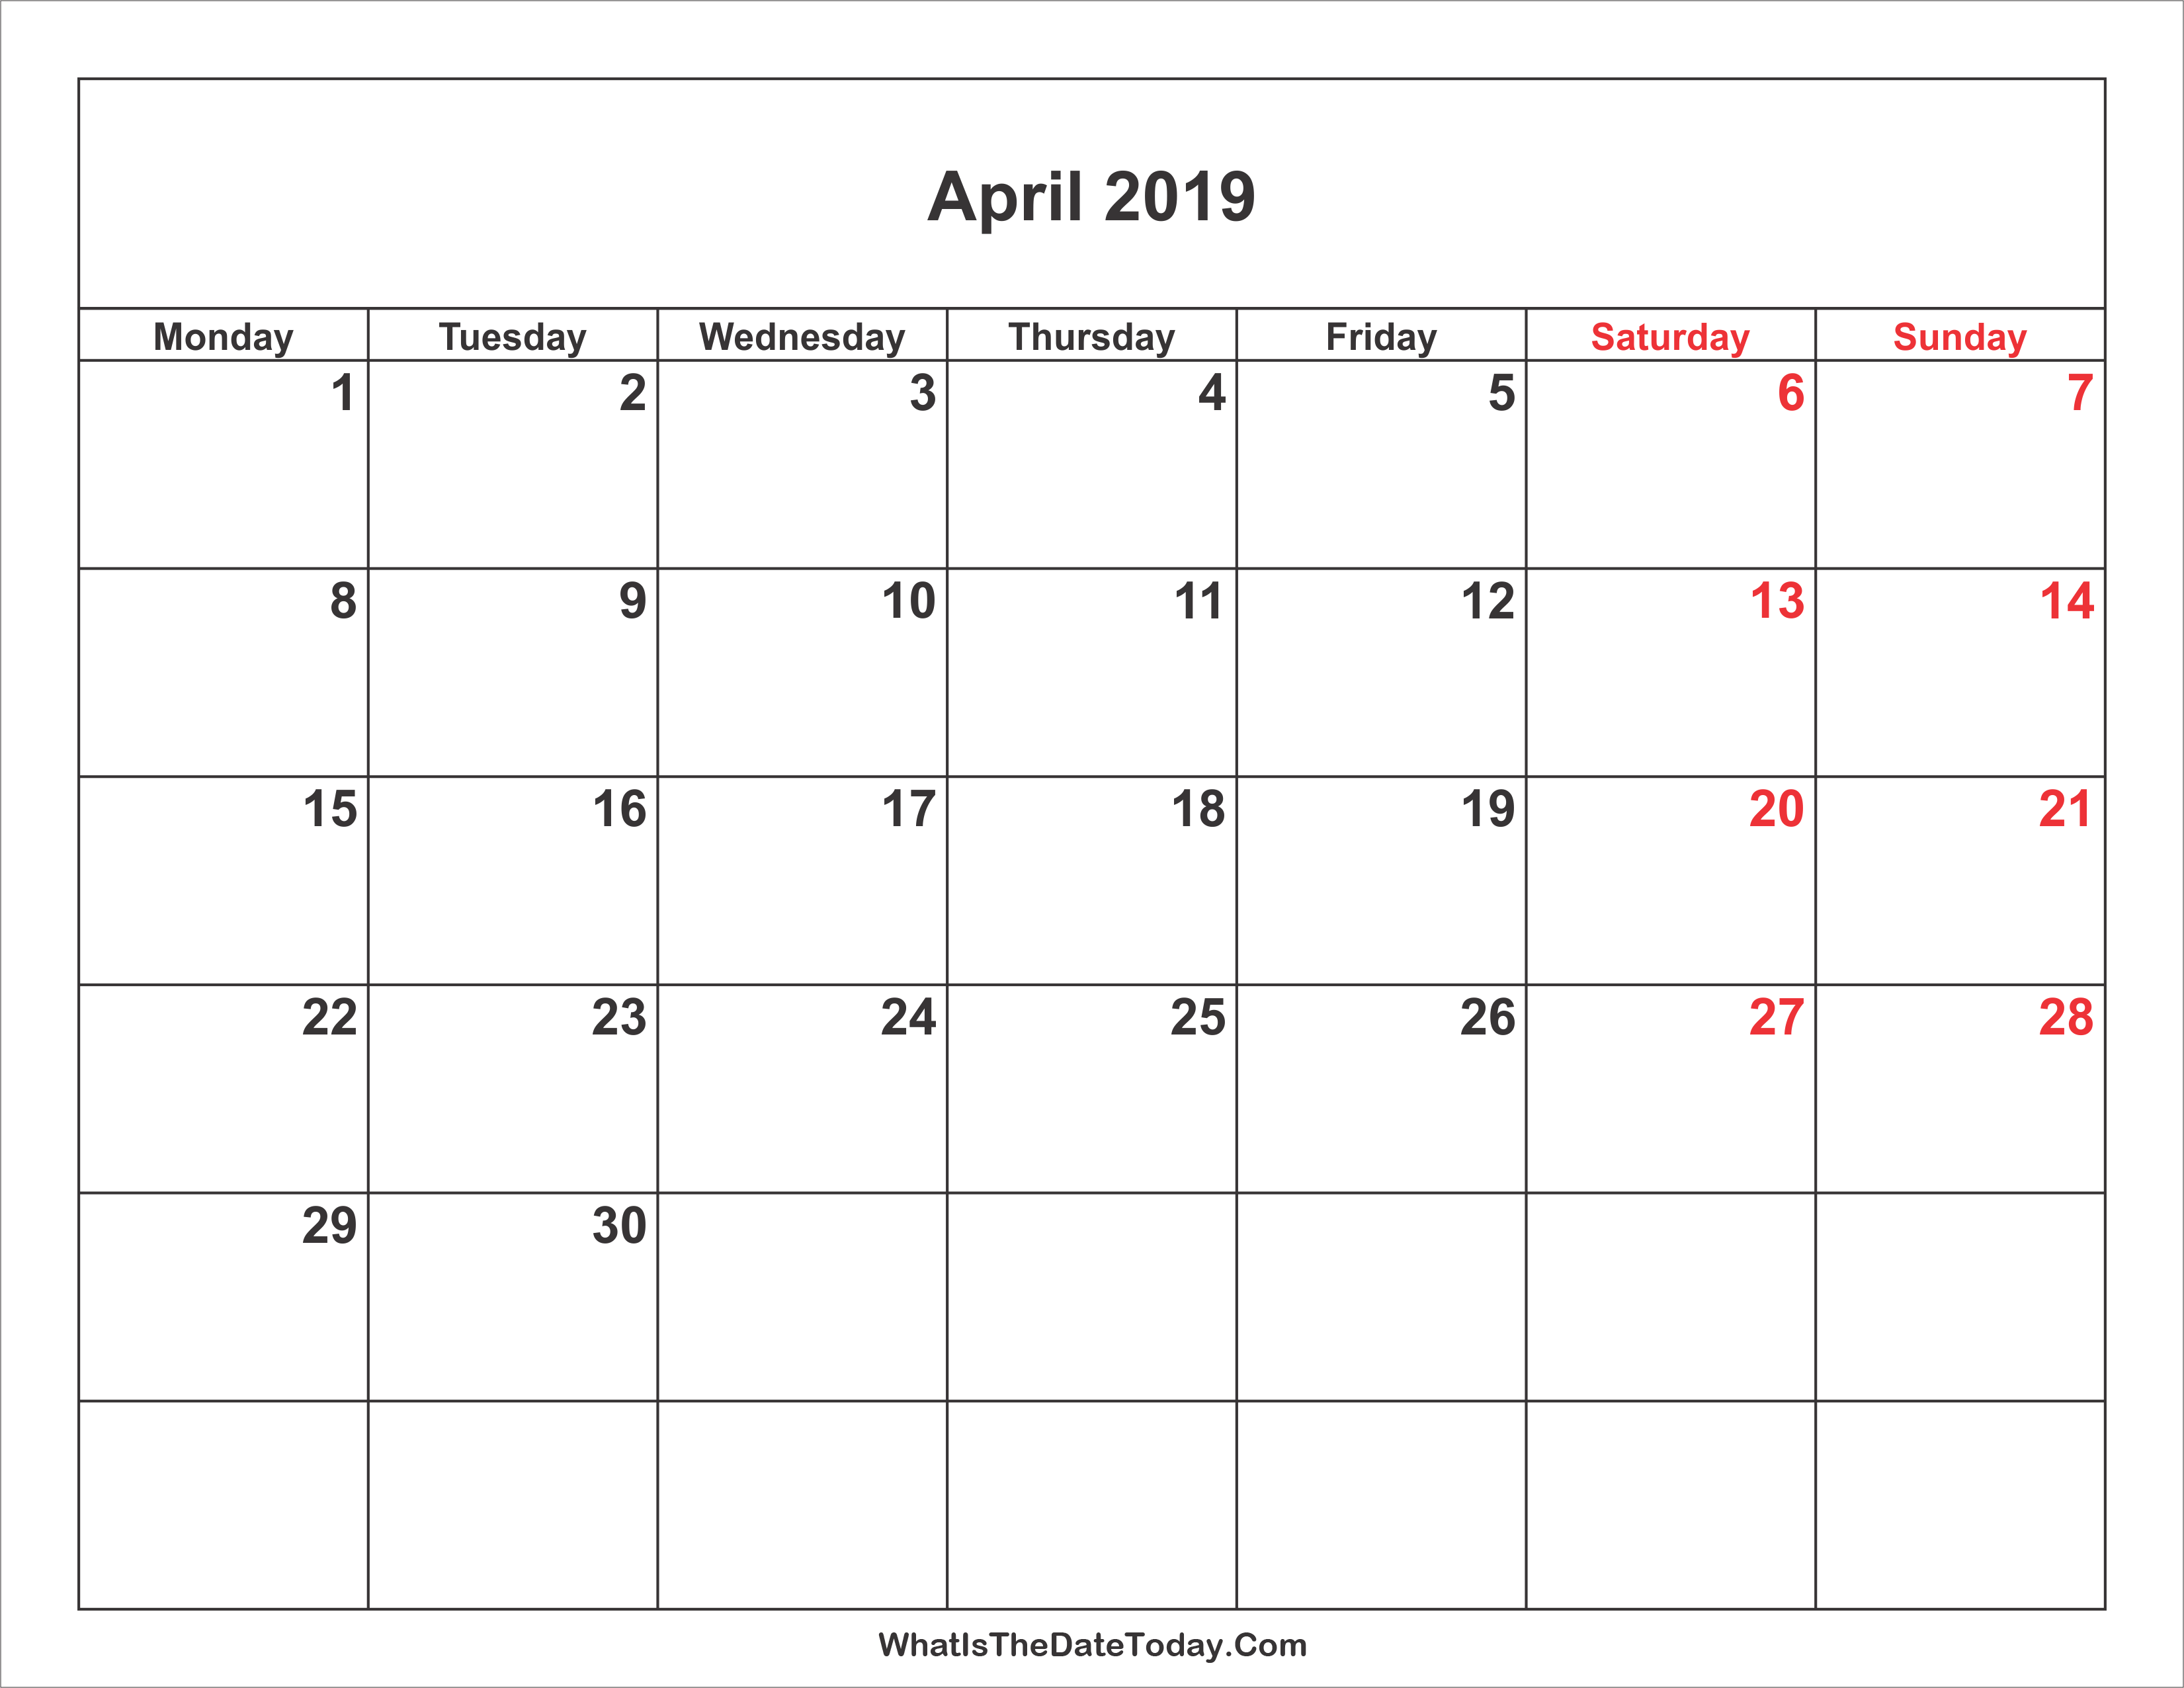 Weekend Calendar 2019 April 2019 Calendar with Weekend Highlight | Whatisthedatetoday.Com